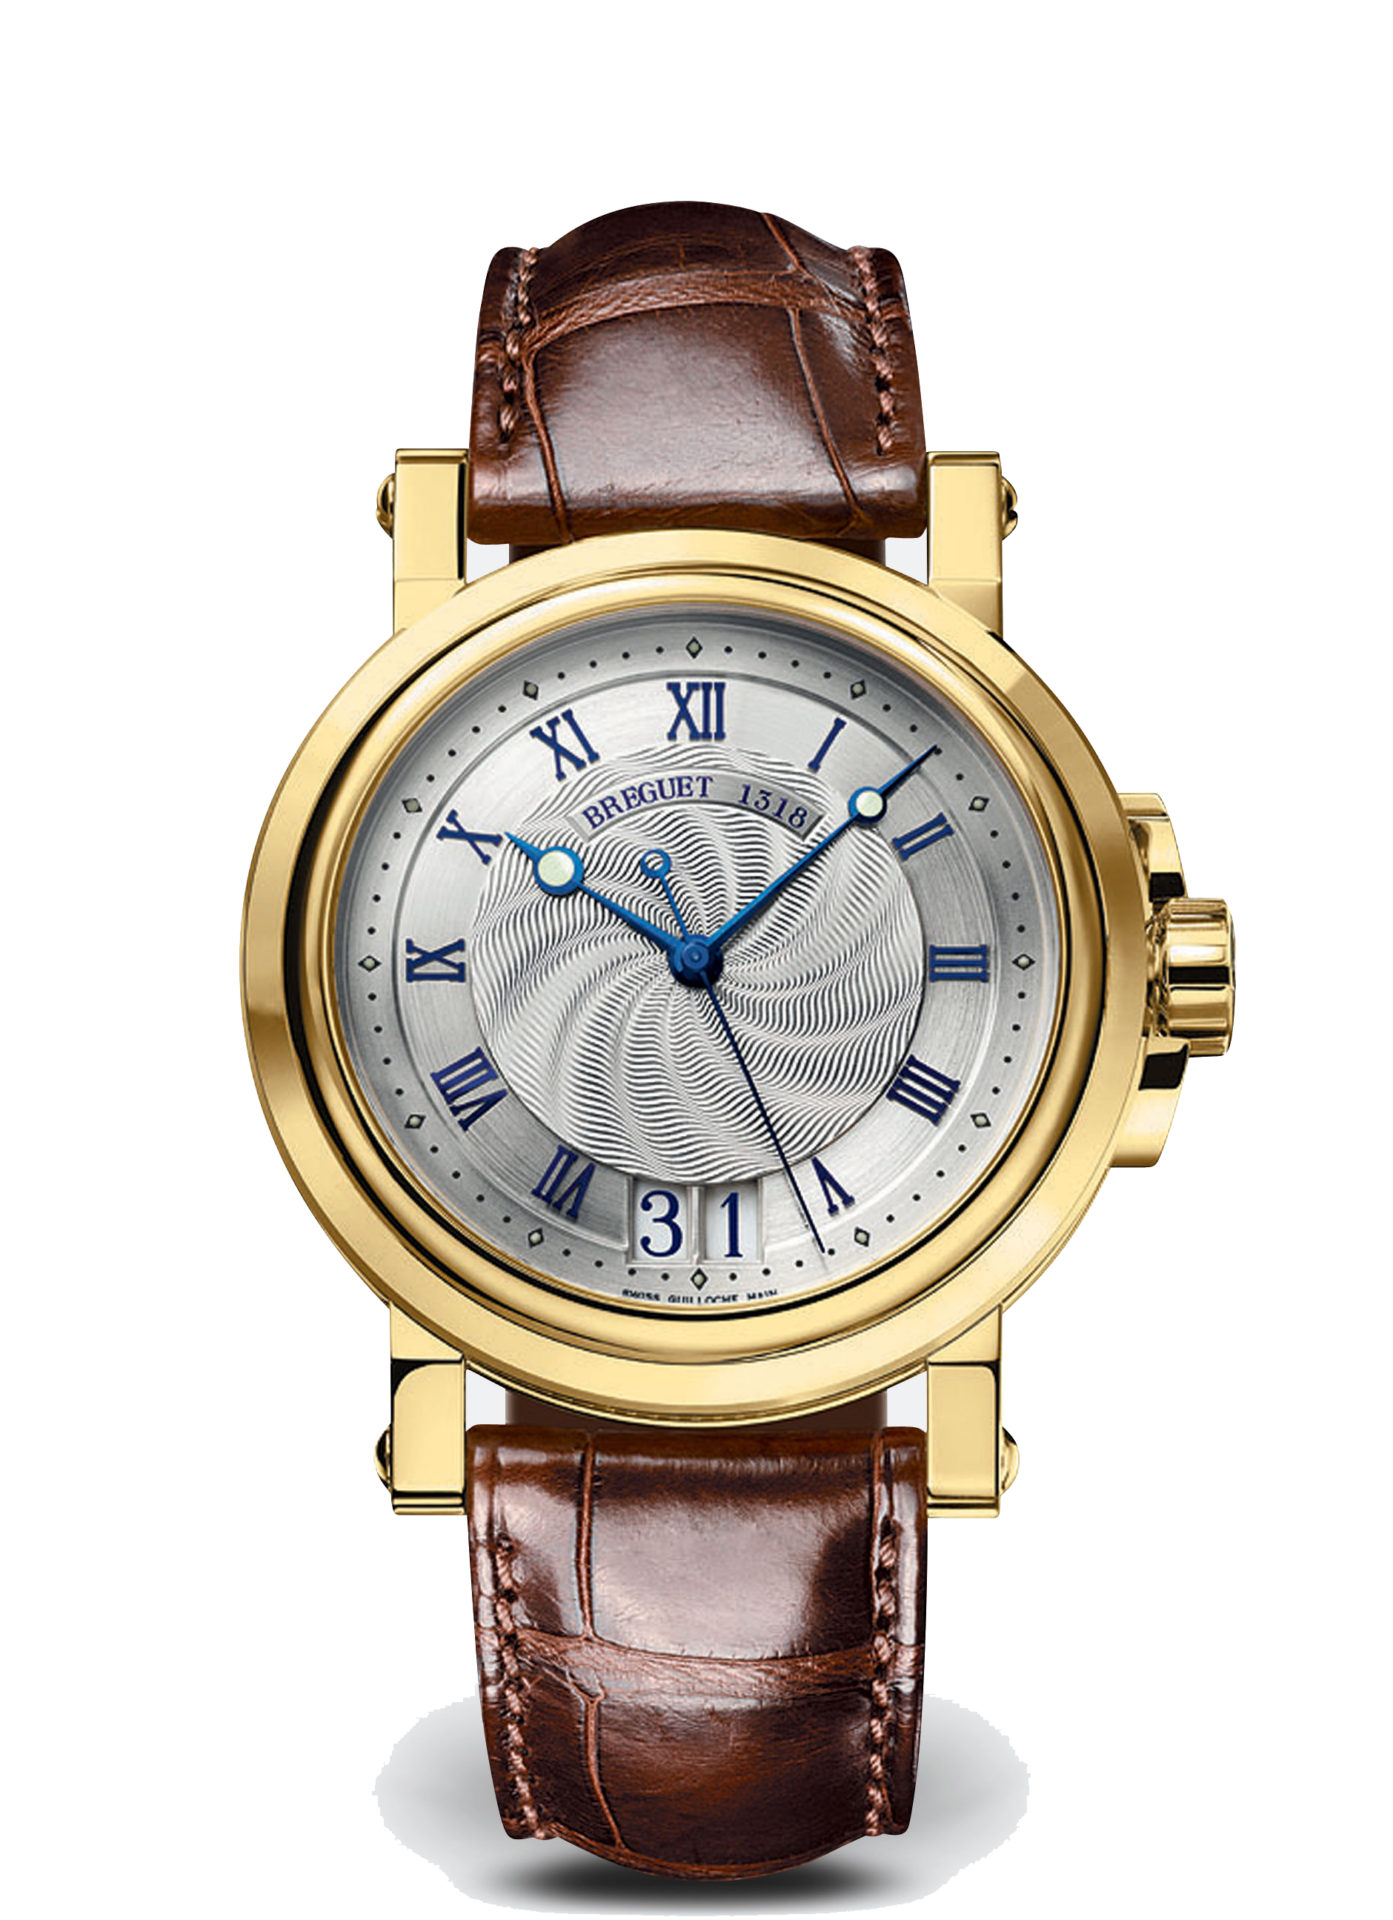 Breguet-La-Marine-5817-Hall-of-Time-5817ba-12-9v8